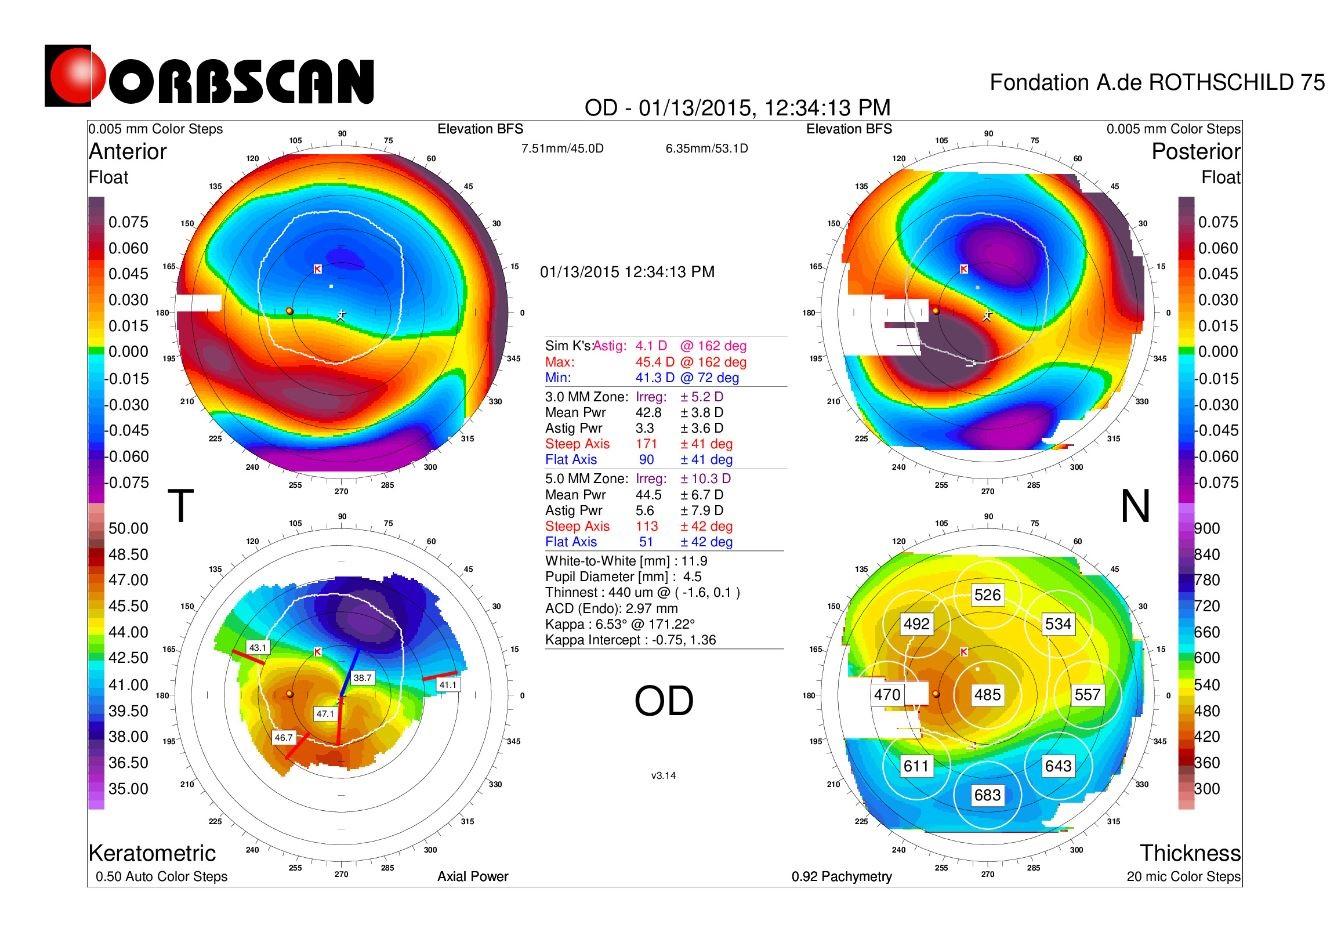 orbscan map post LASIK ectasia